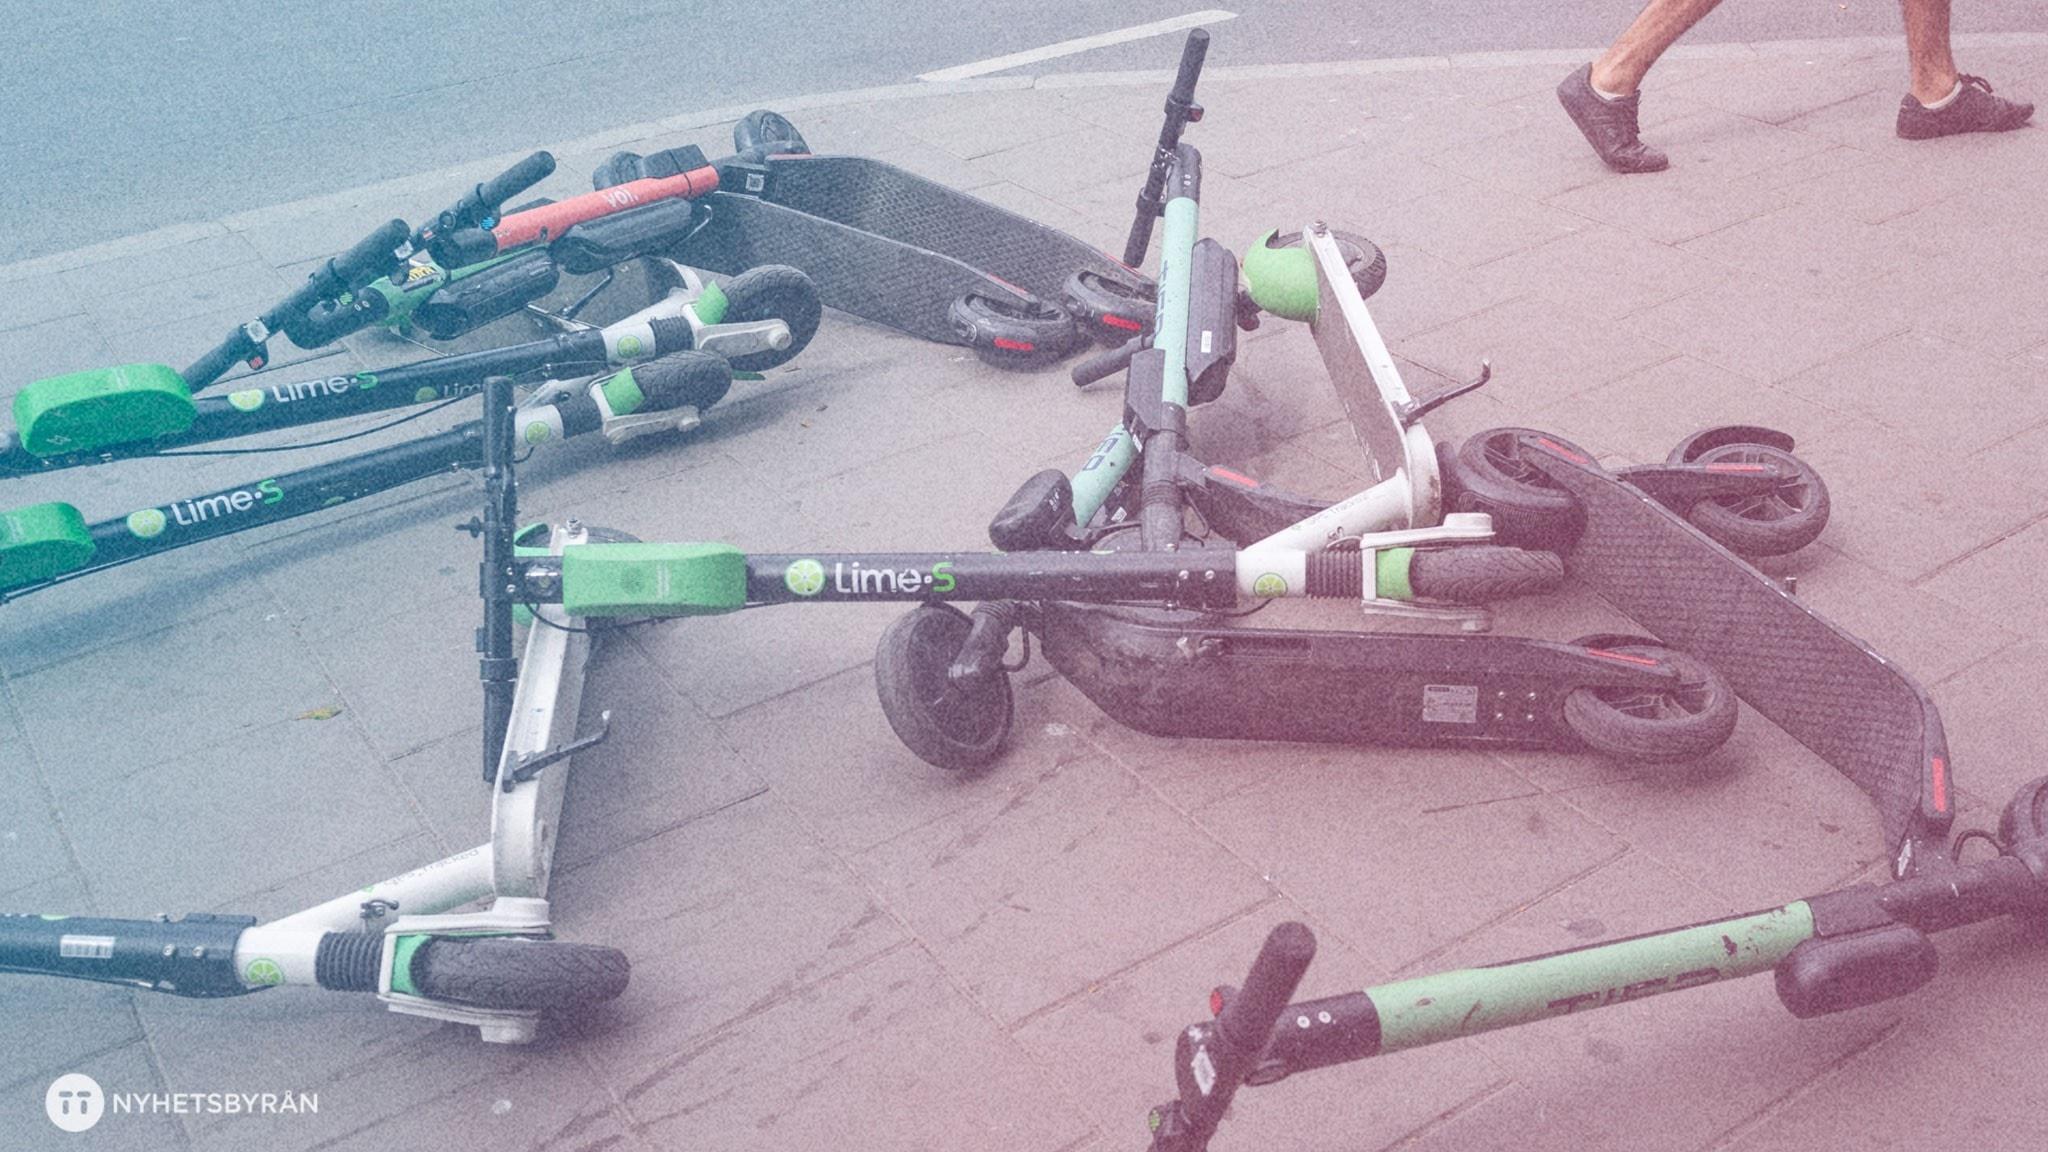 Poddbild-elsparkcykel2